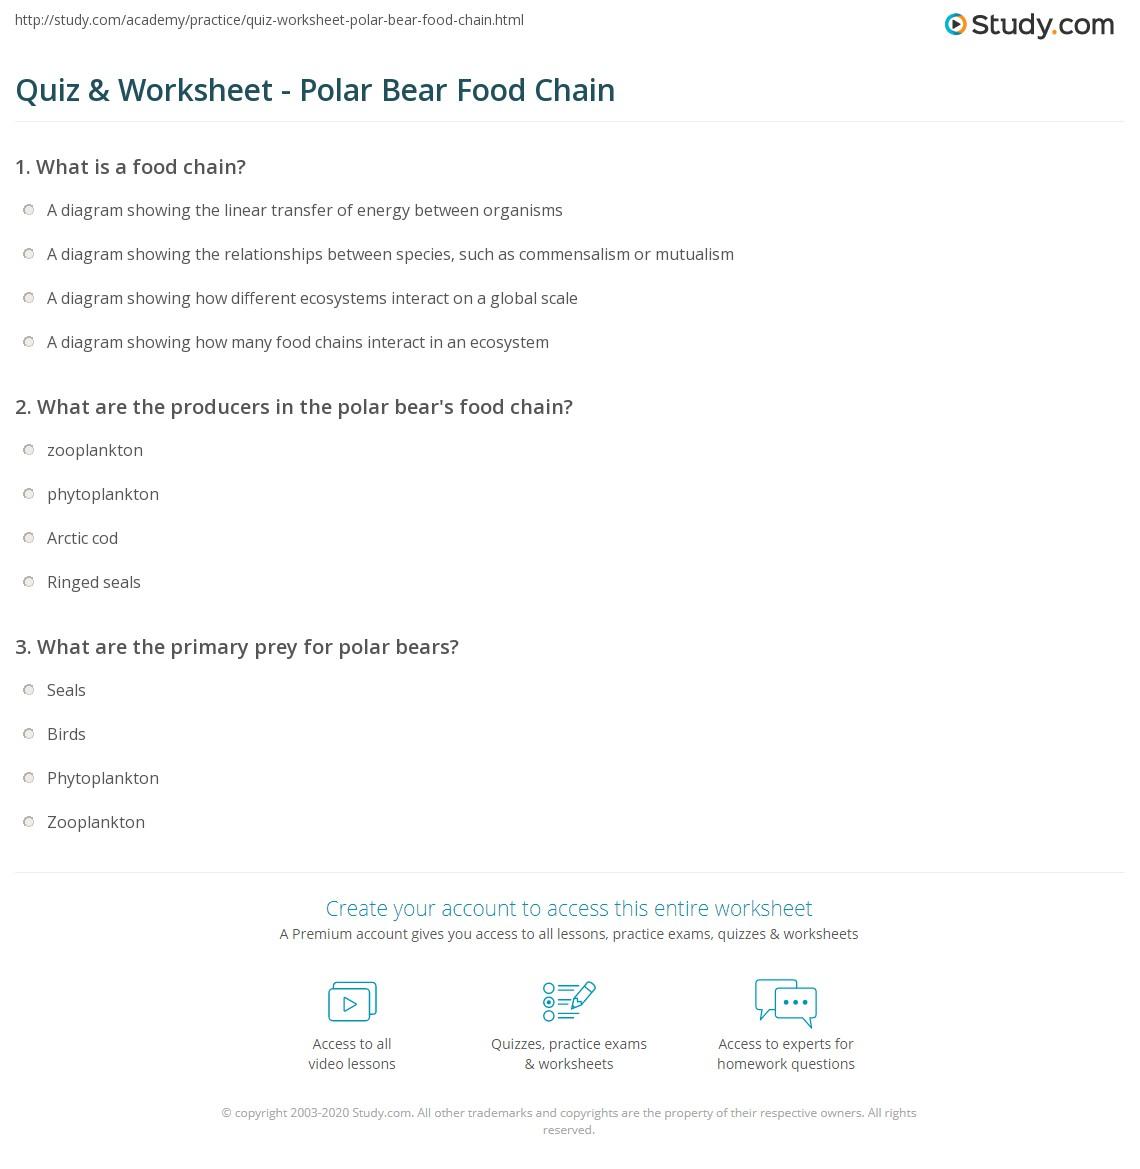 Quiz & Worksheet - Polar Bear Food Chain   Study.com